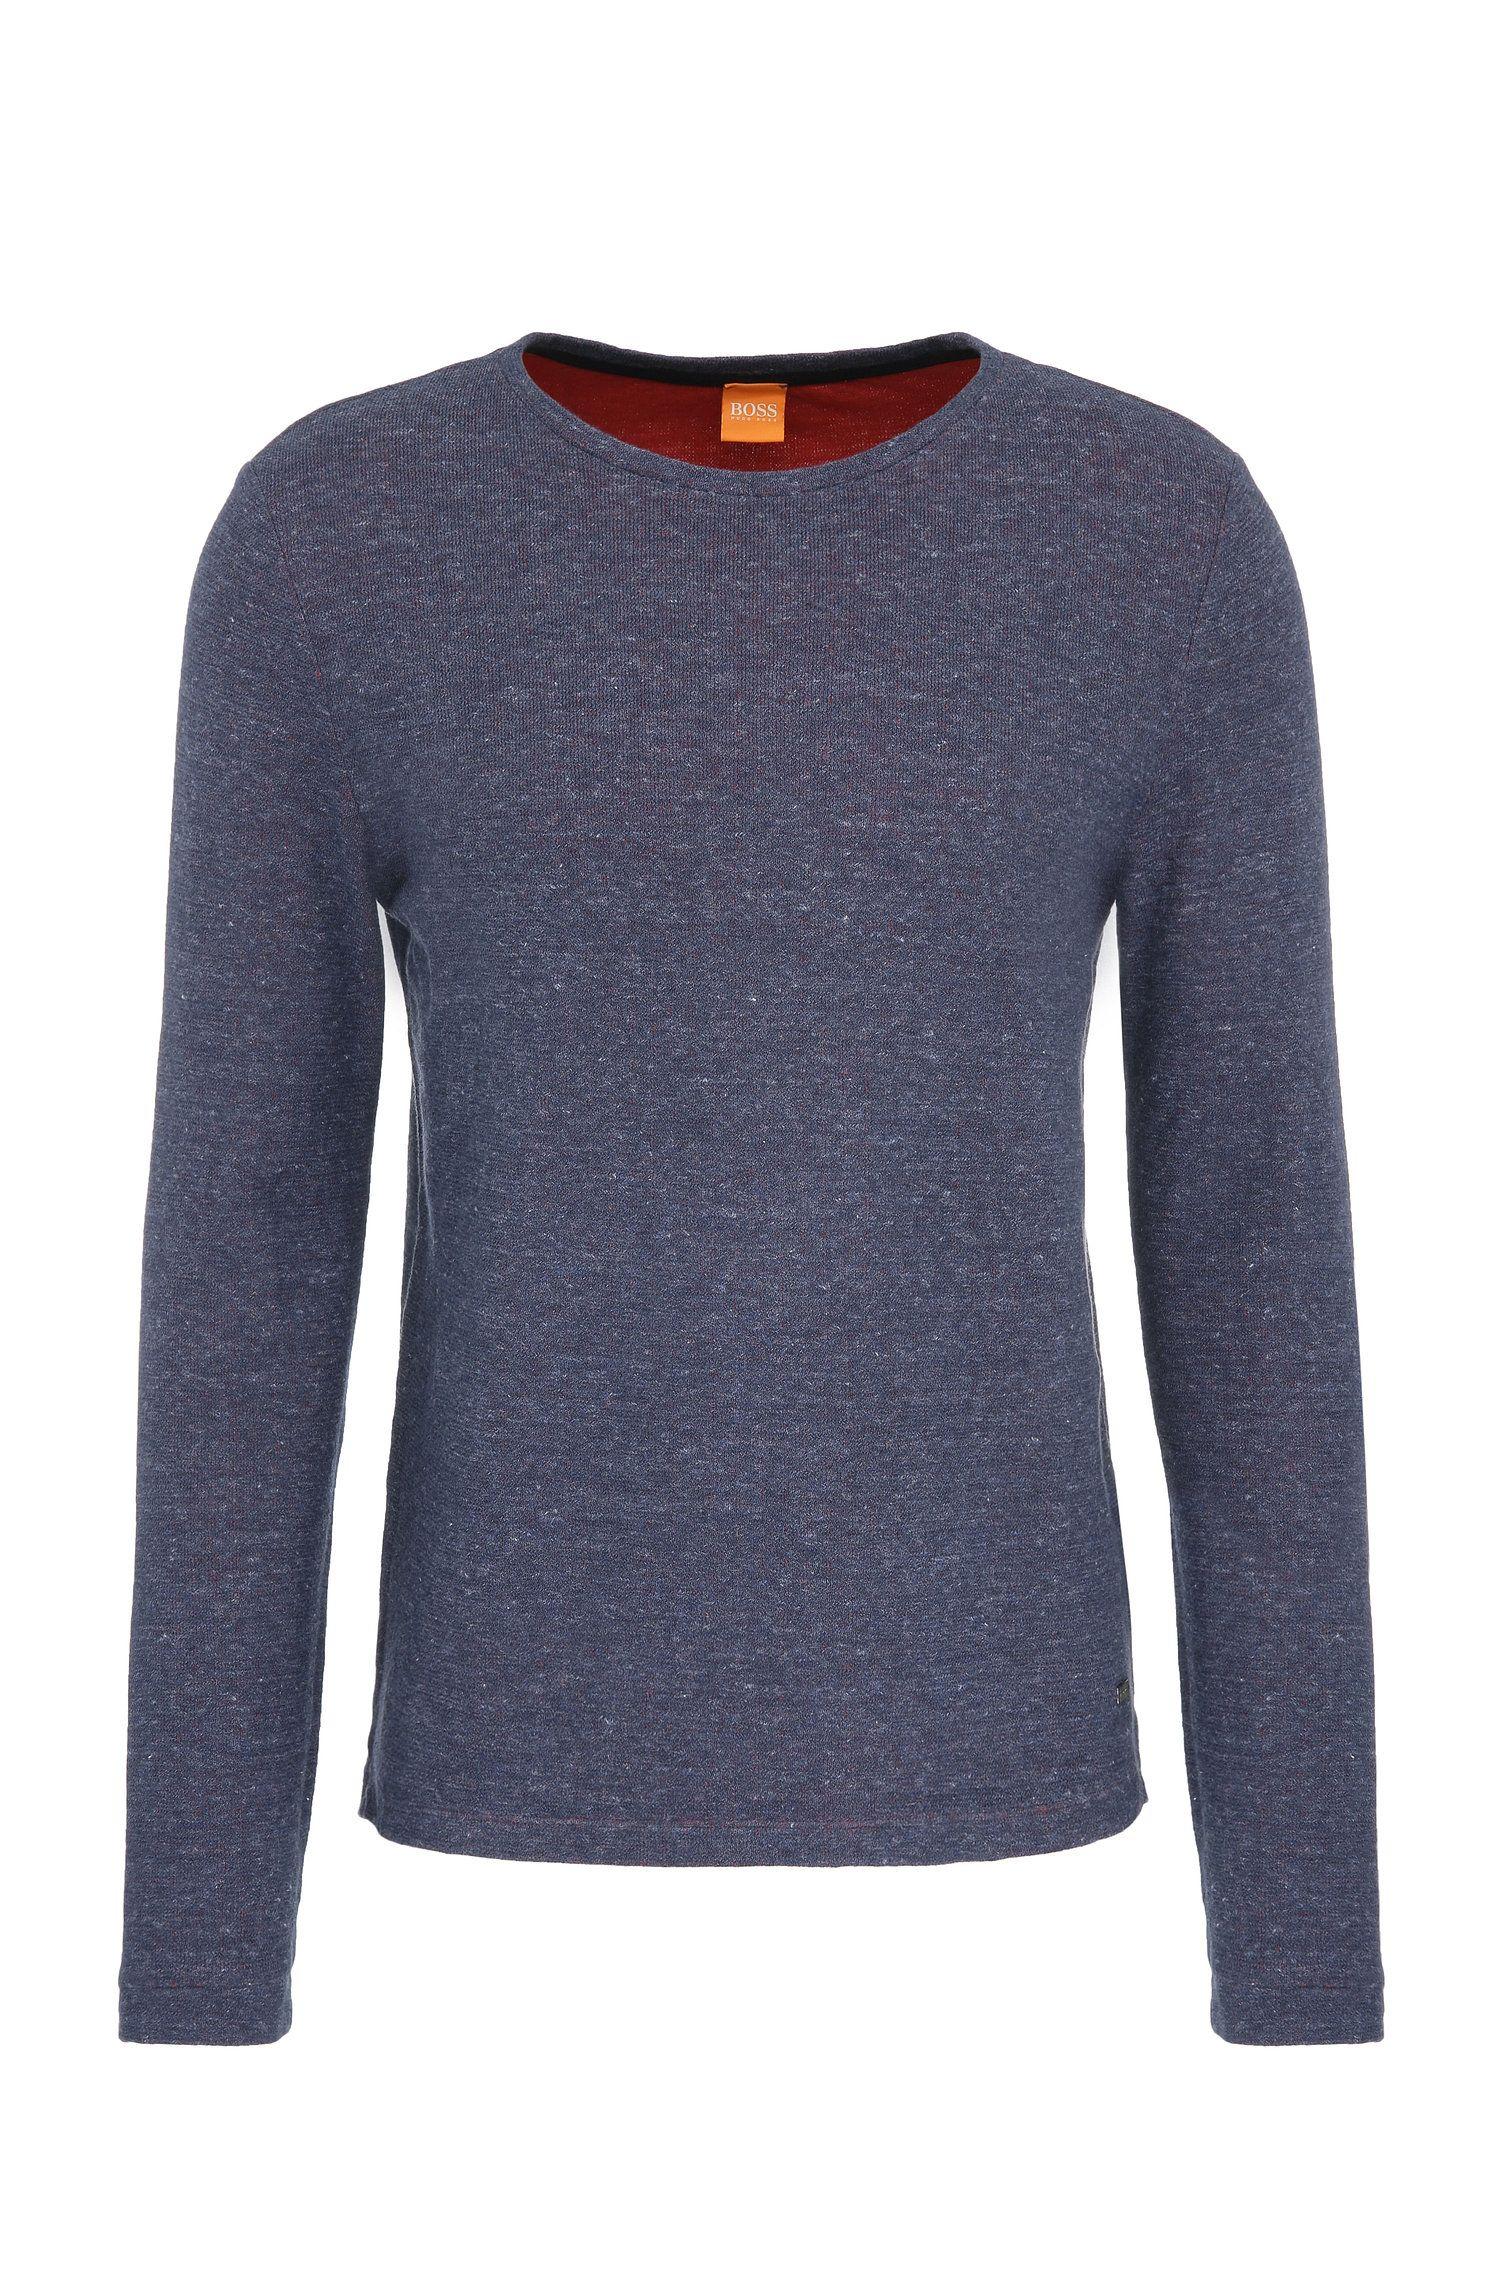 Cotton Melange Long Sleeve Shirt   Wanna